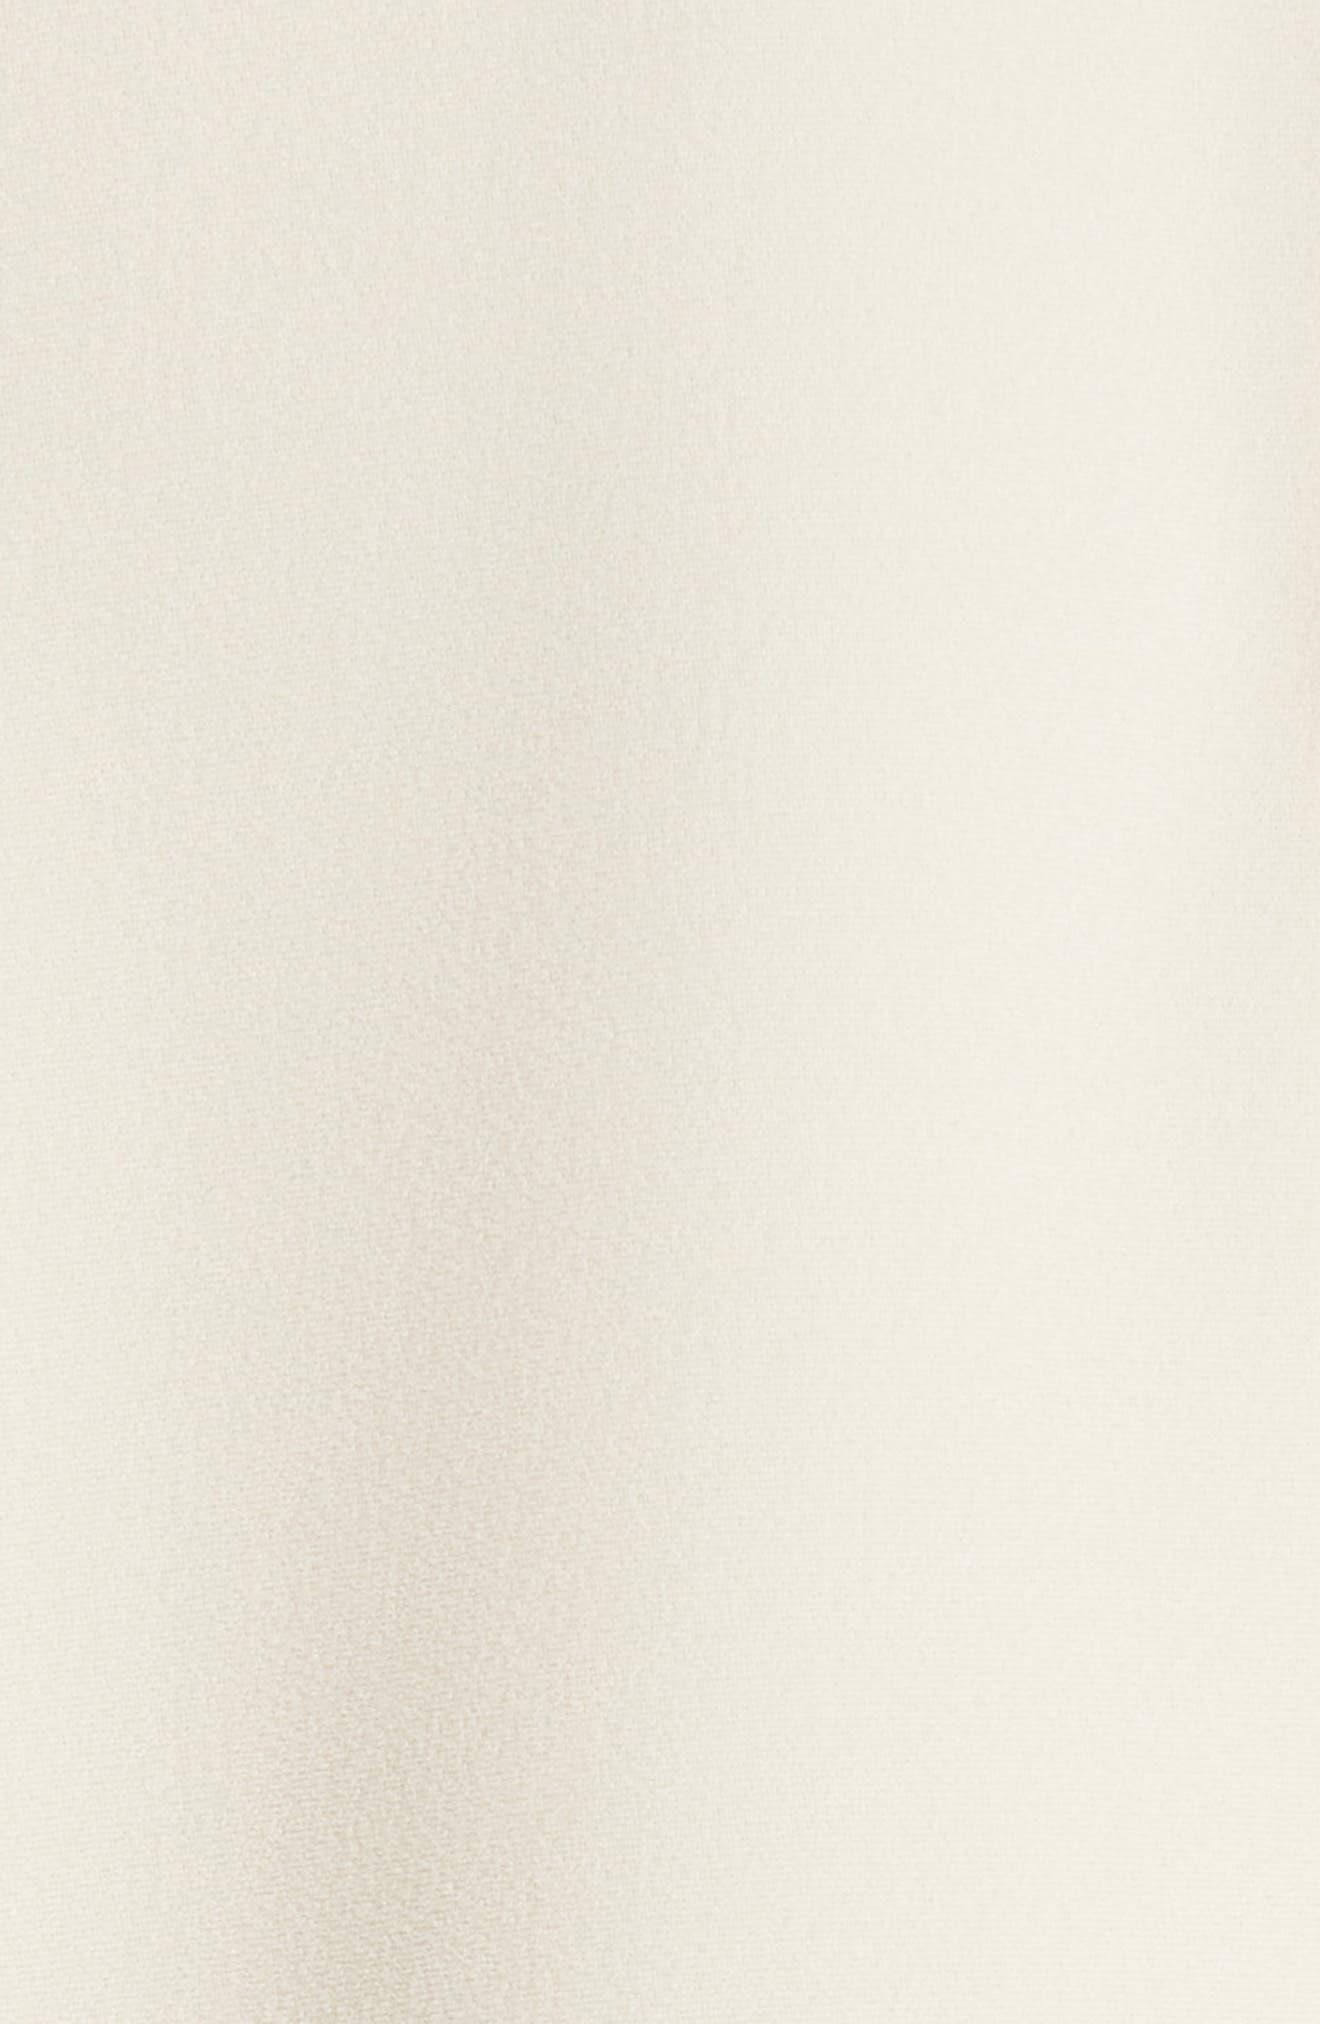 VICTORIA BECKHAM, Leather Trim Top, Alternate thumbnail 6, color, MILK/ BLACK